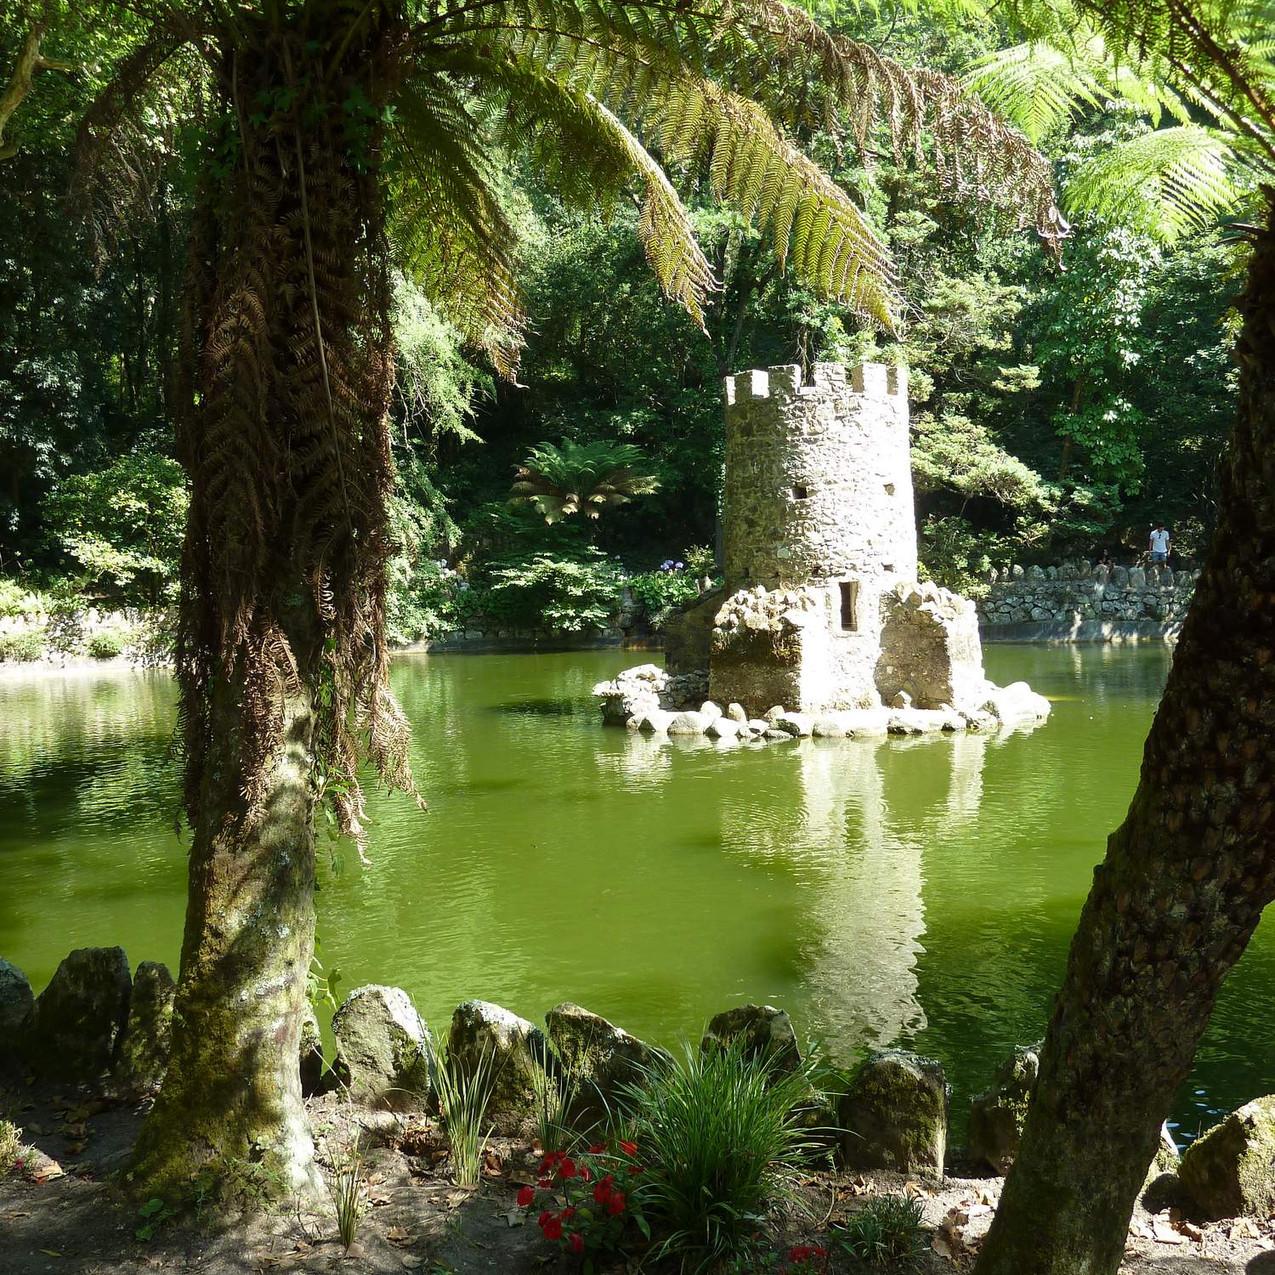 Valley of the Lakes at Pena Palace